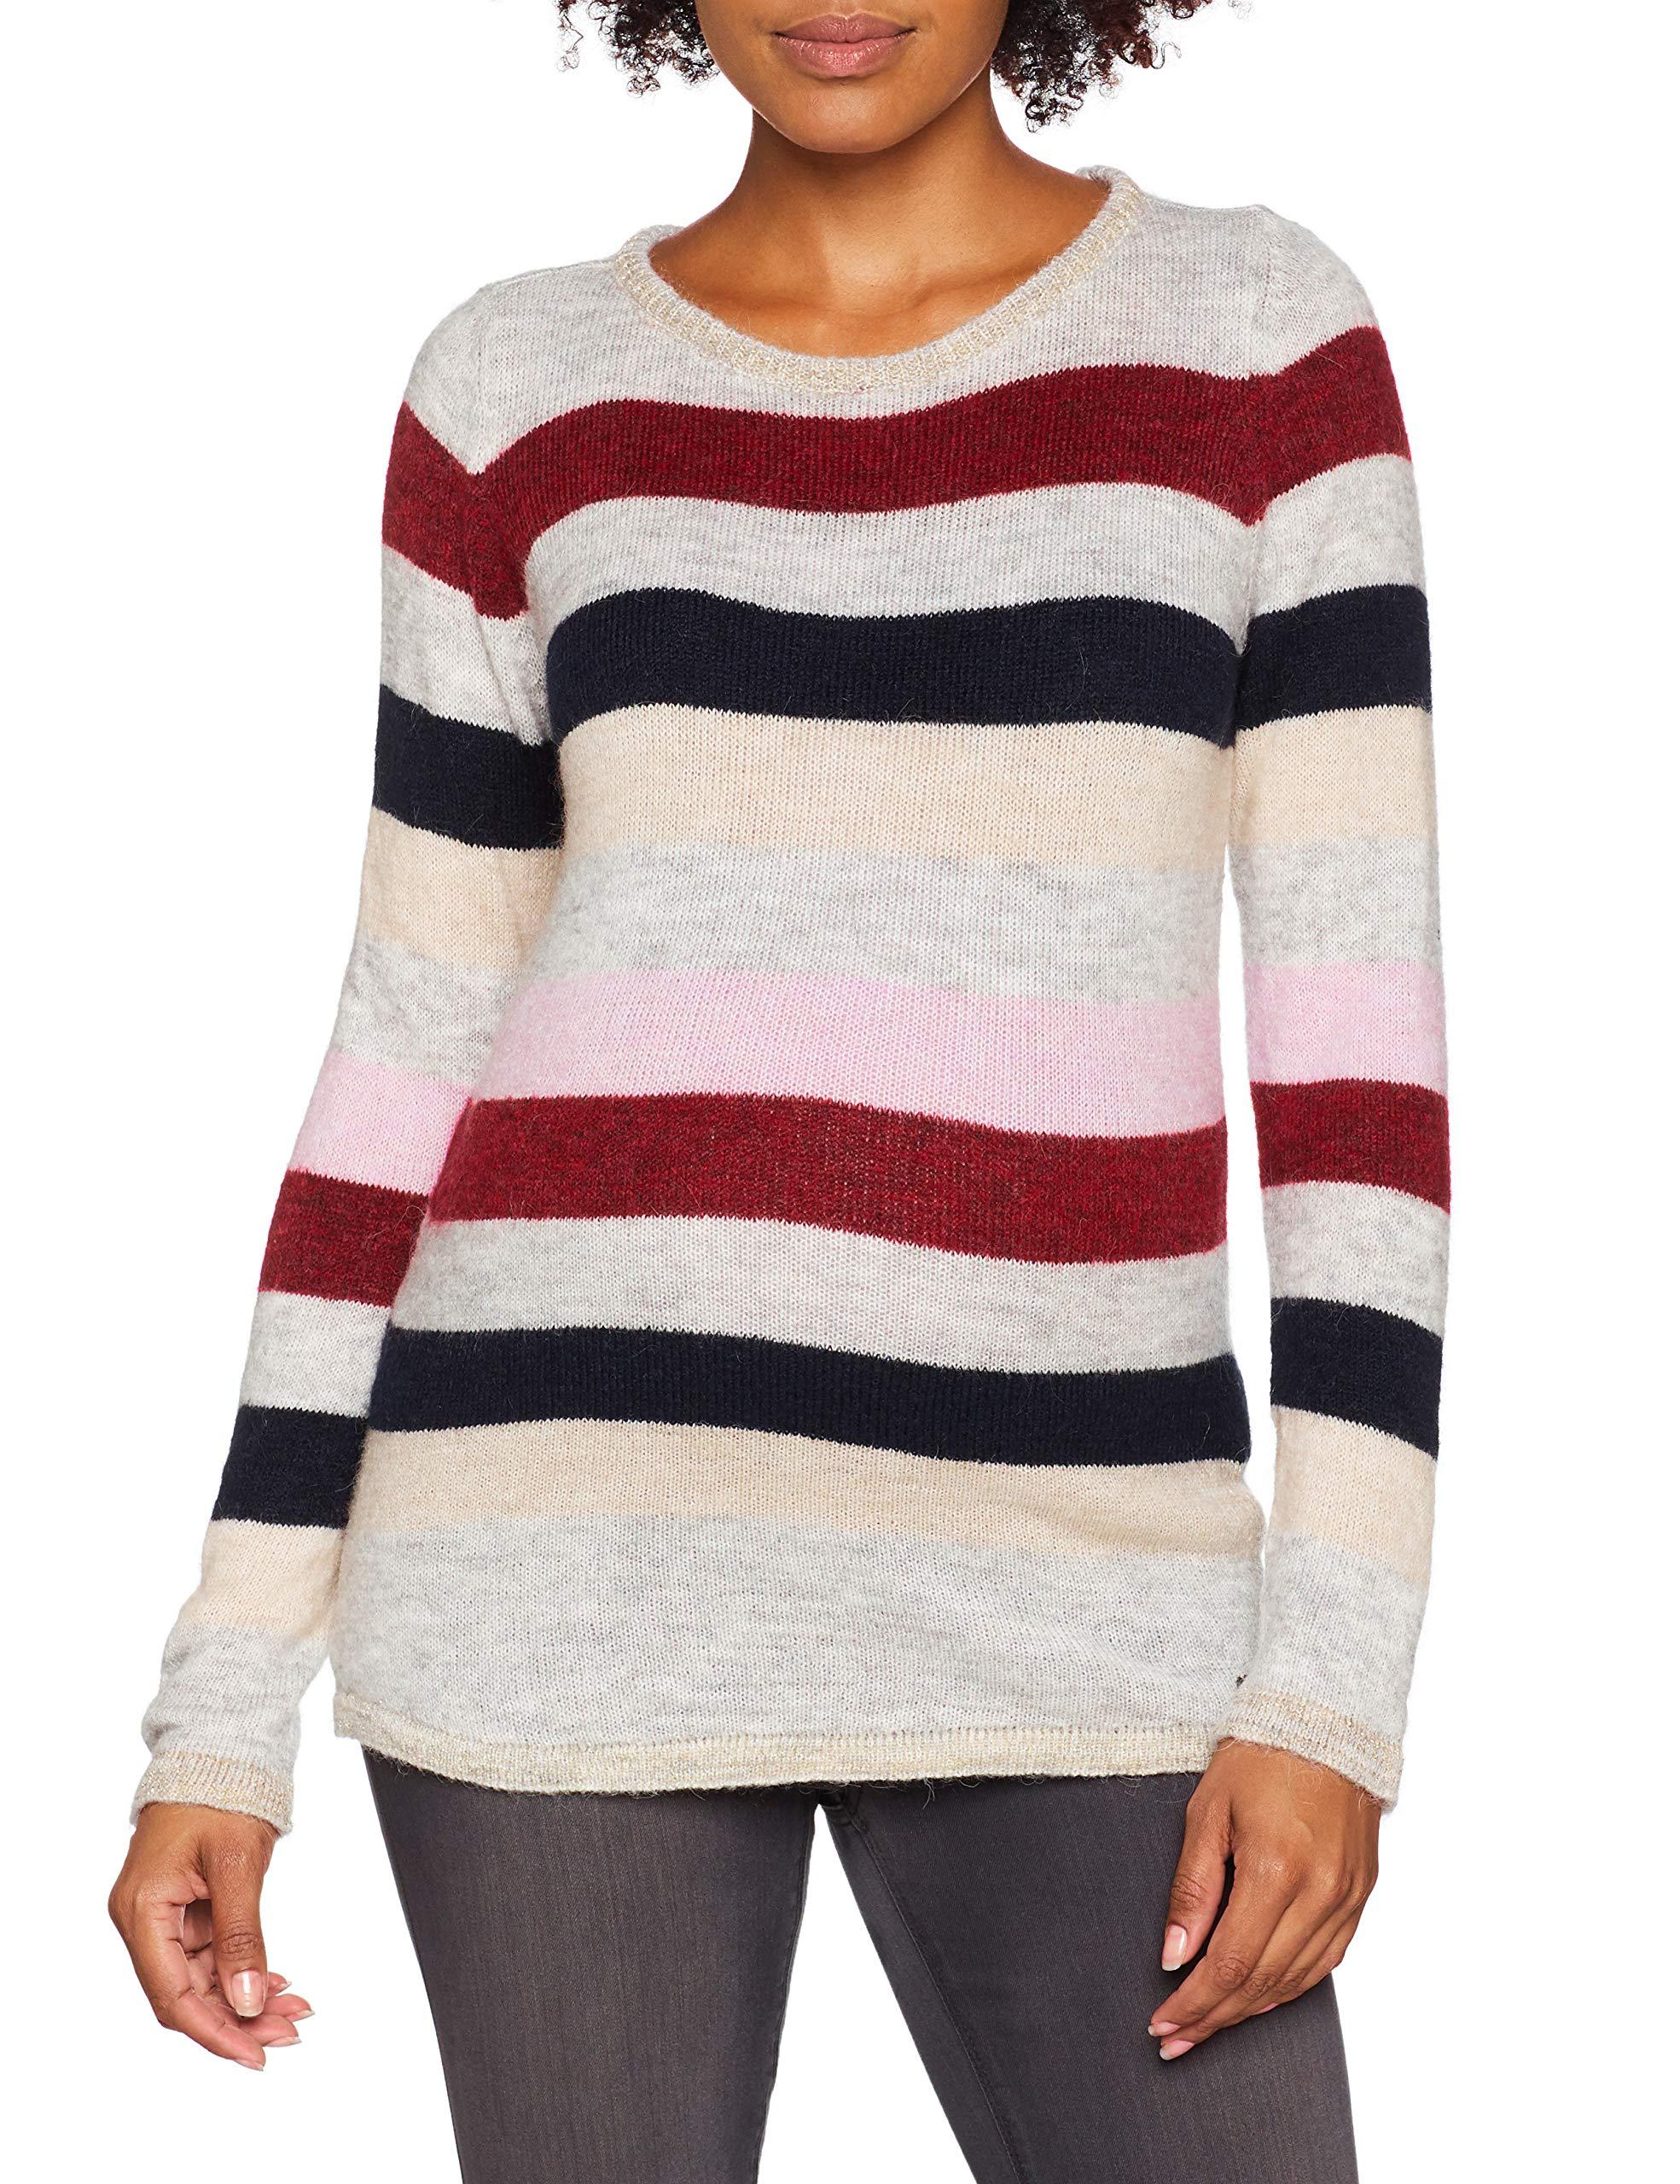 Esprit Sweater Salmon Ls Yd Pull MaternitéMulticolorered 62338taille Maternity FabricantSFemme De SUMVqzp